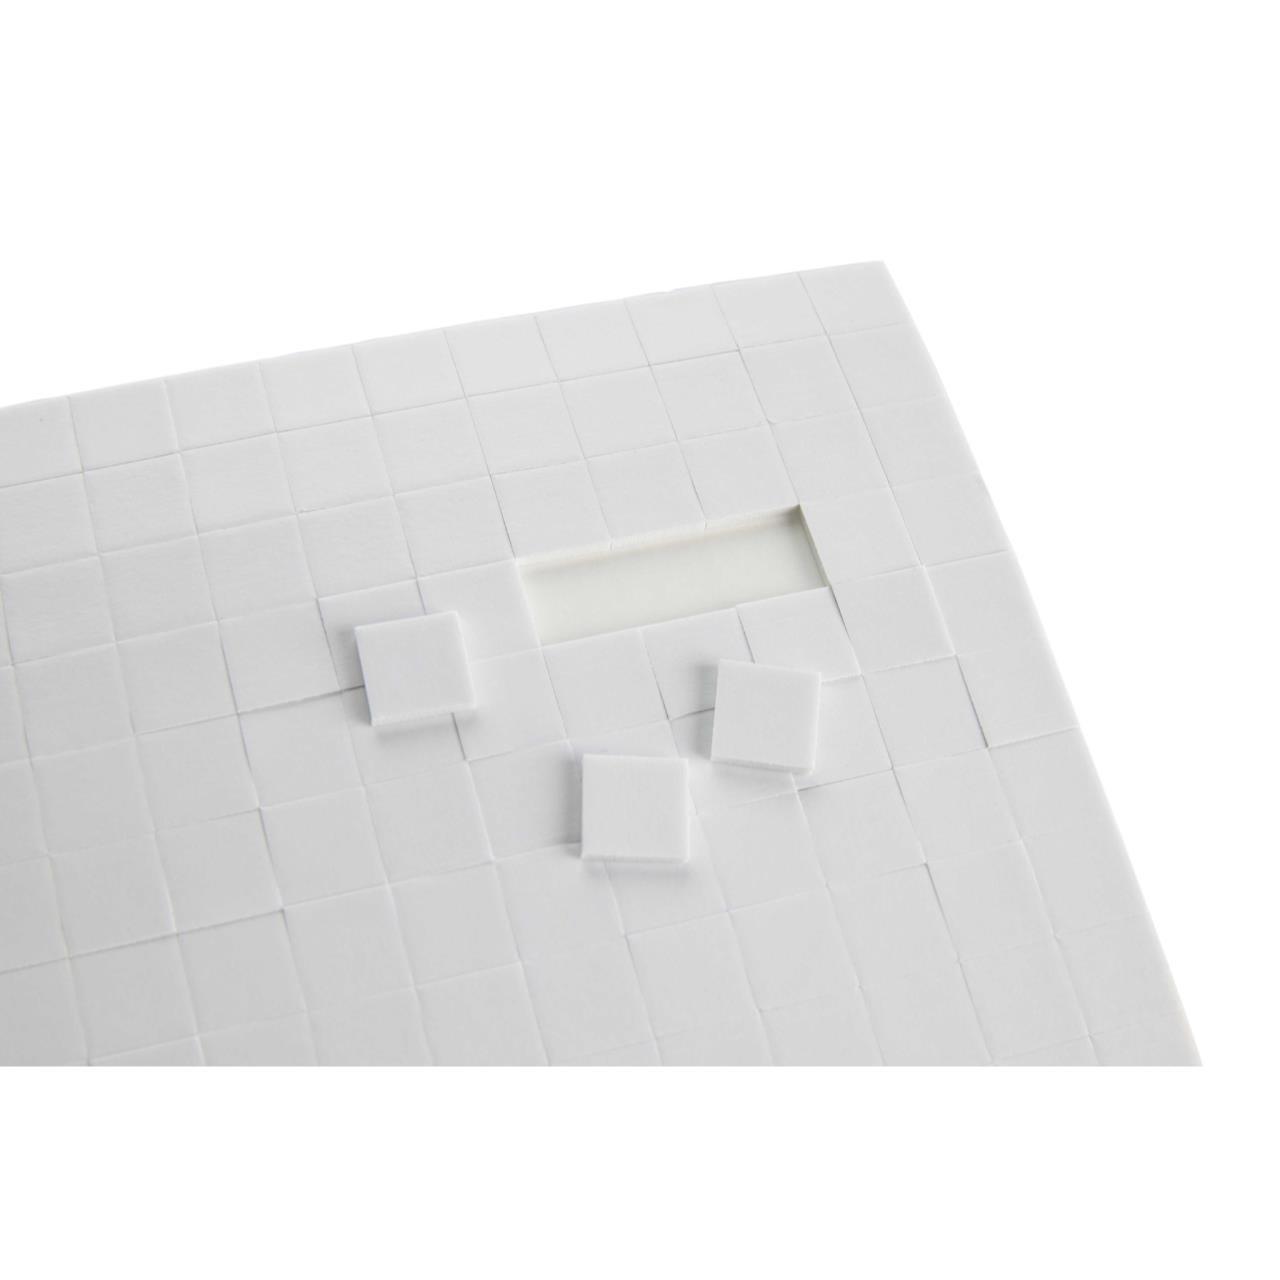 X-Press It Foam Mounting Squares, 1/2 x 1/2 -